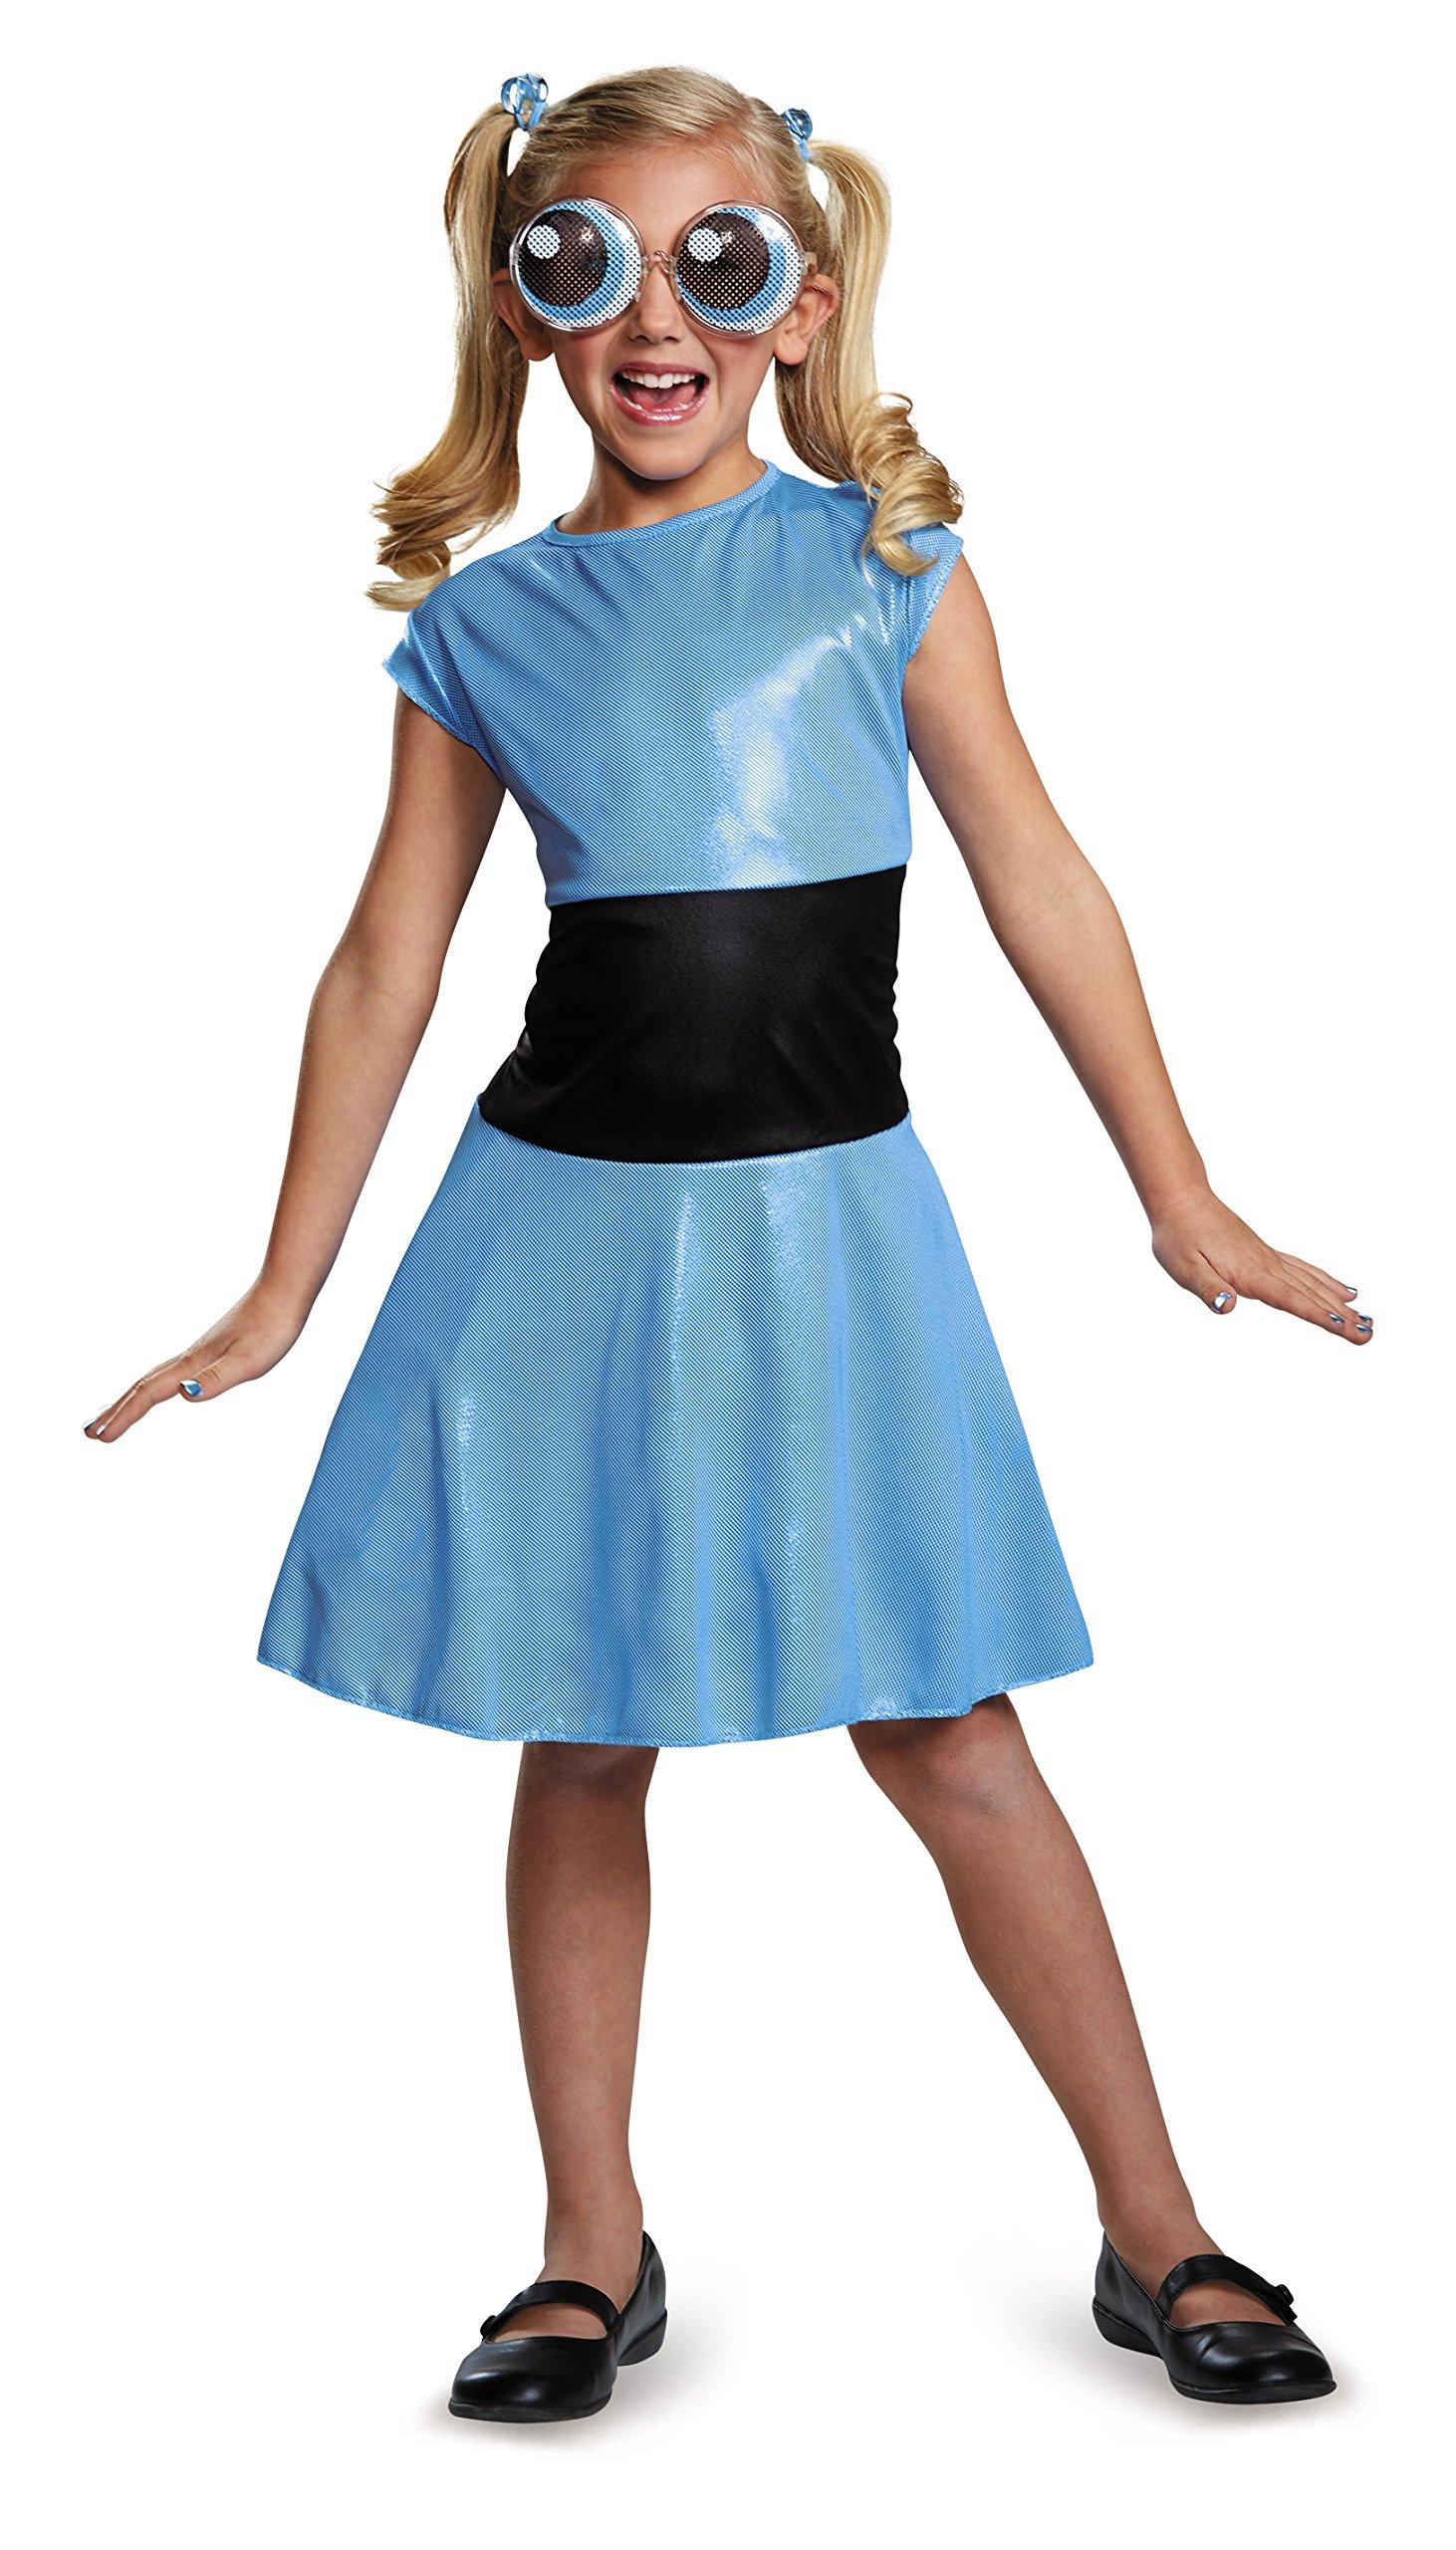 Disguise Bubbles Classic Powerpuff Girls Cartoon Network Costume, Large/10-12